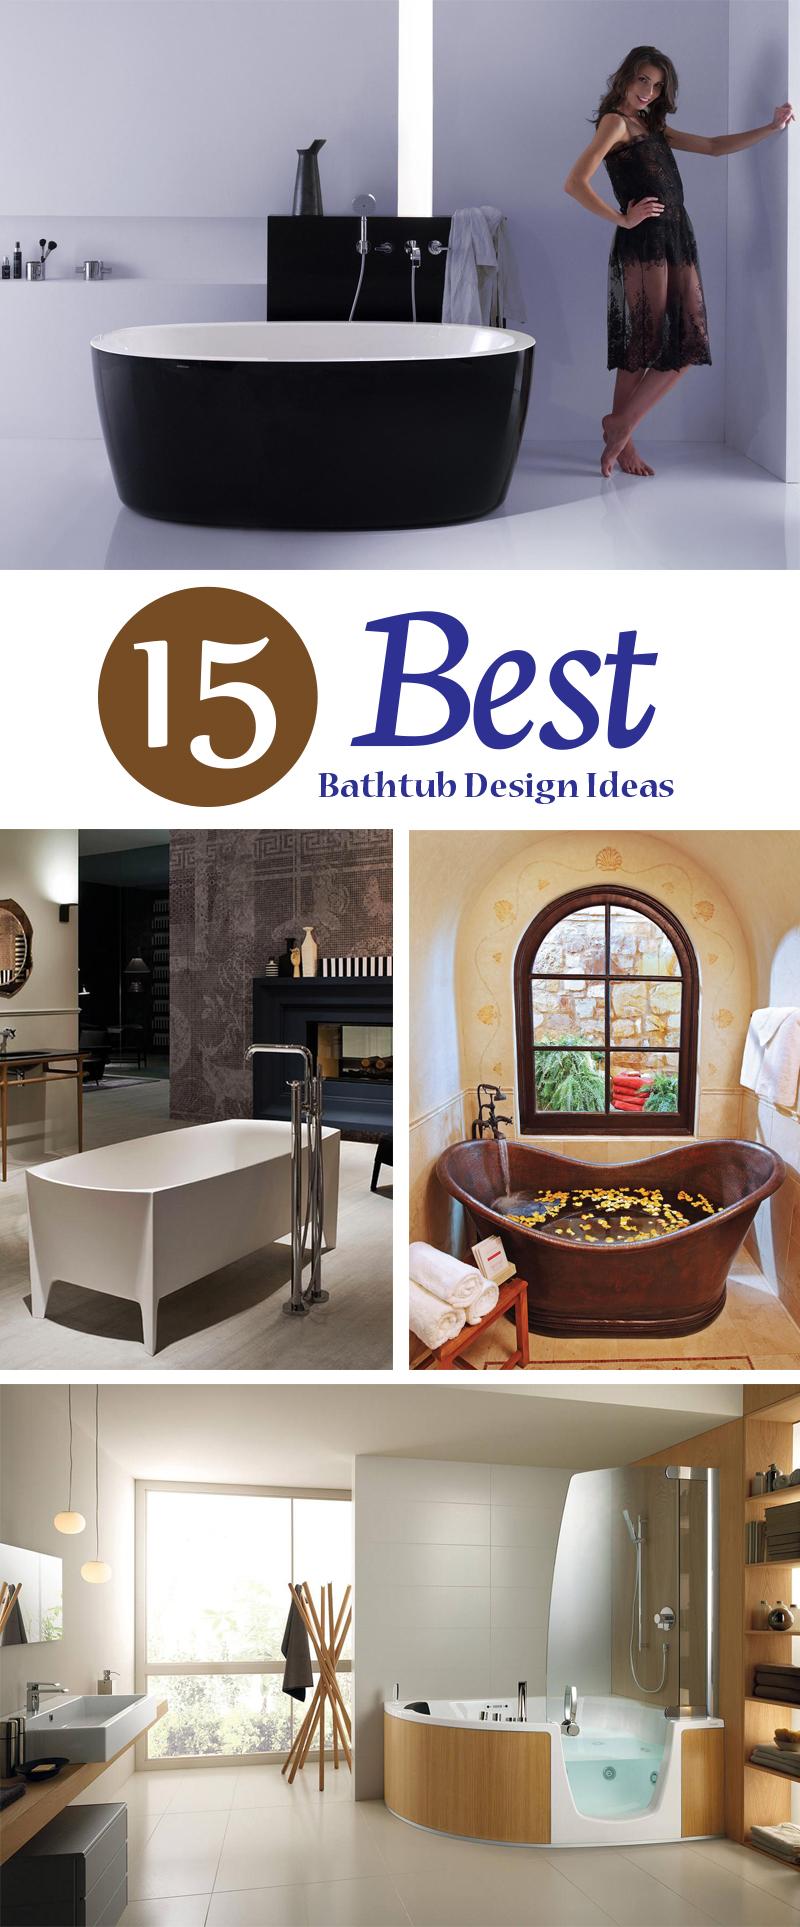 Best Bathtub Ideas and designs